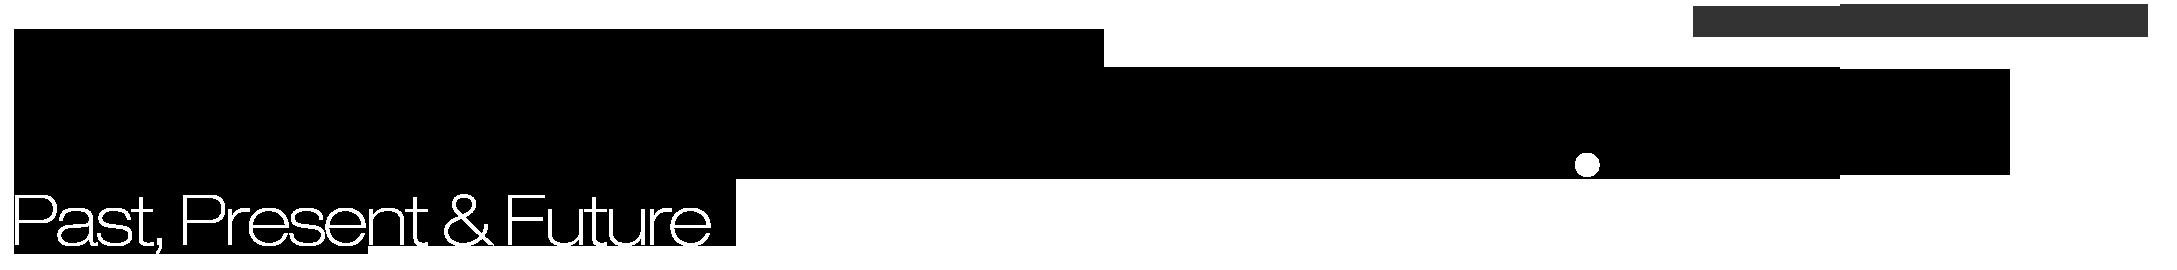 JulilandUniverse.com Retina Logo